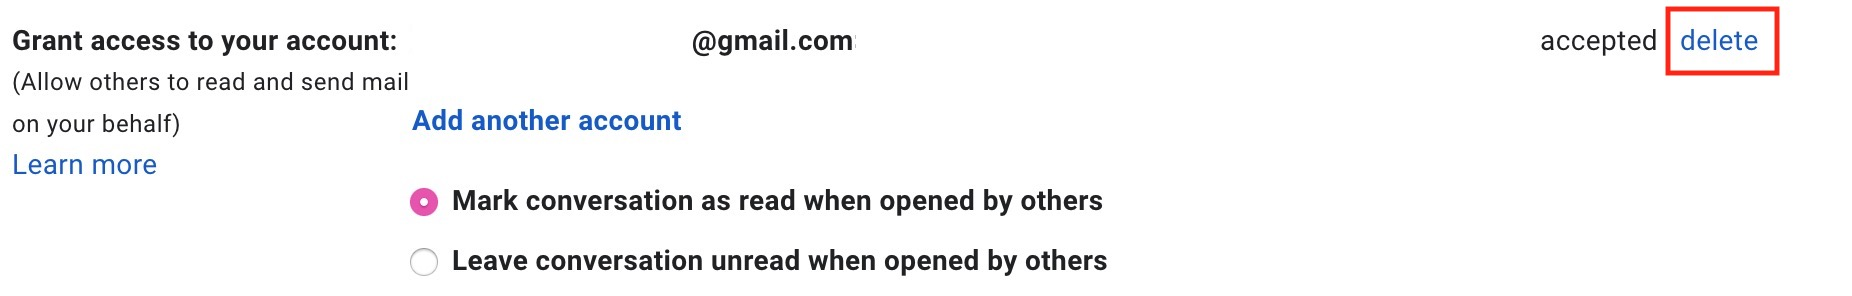 Delete Access to Gmail